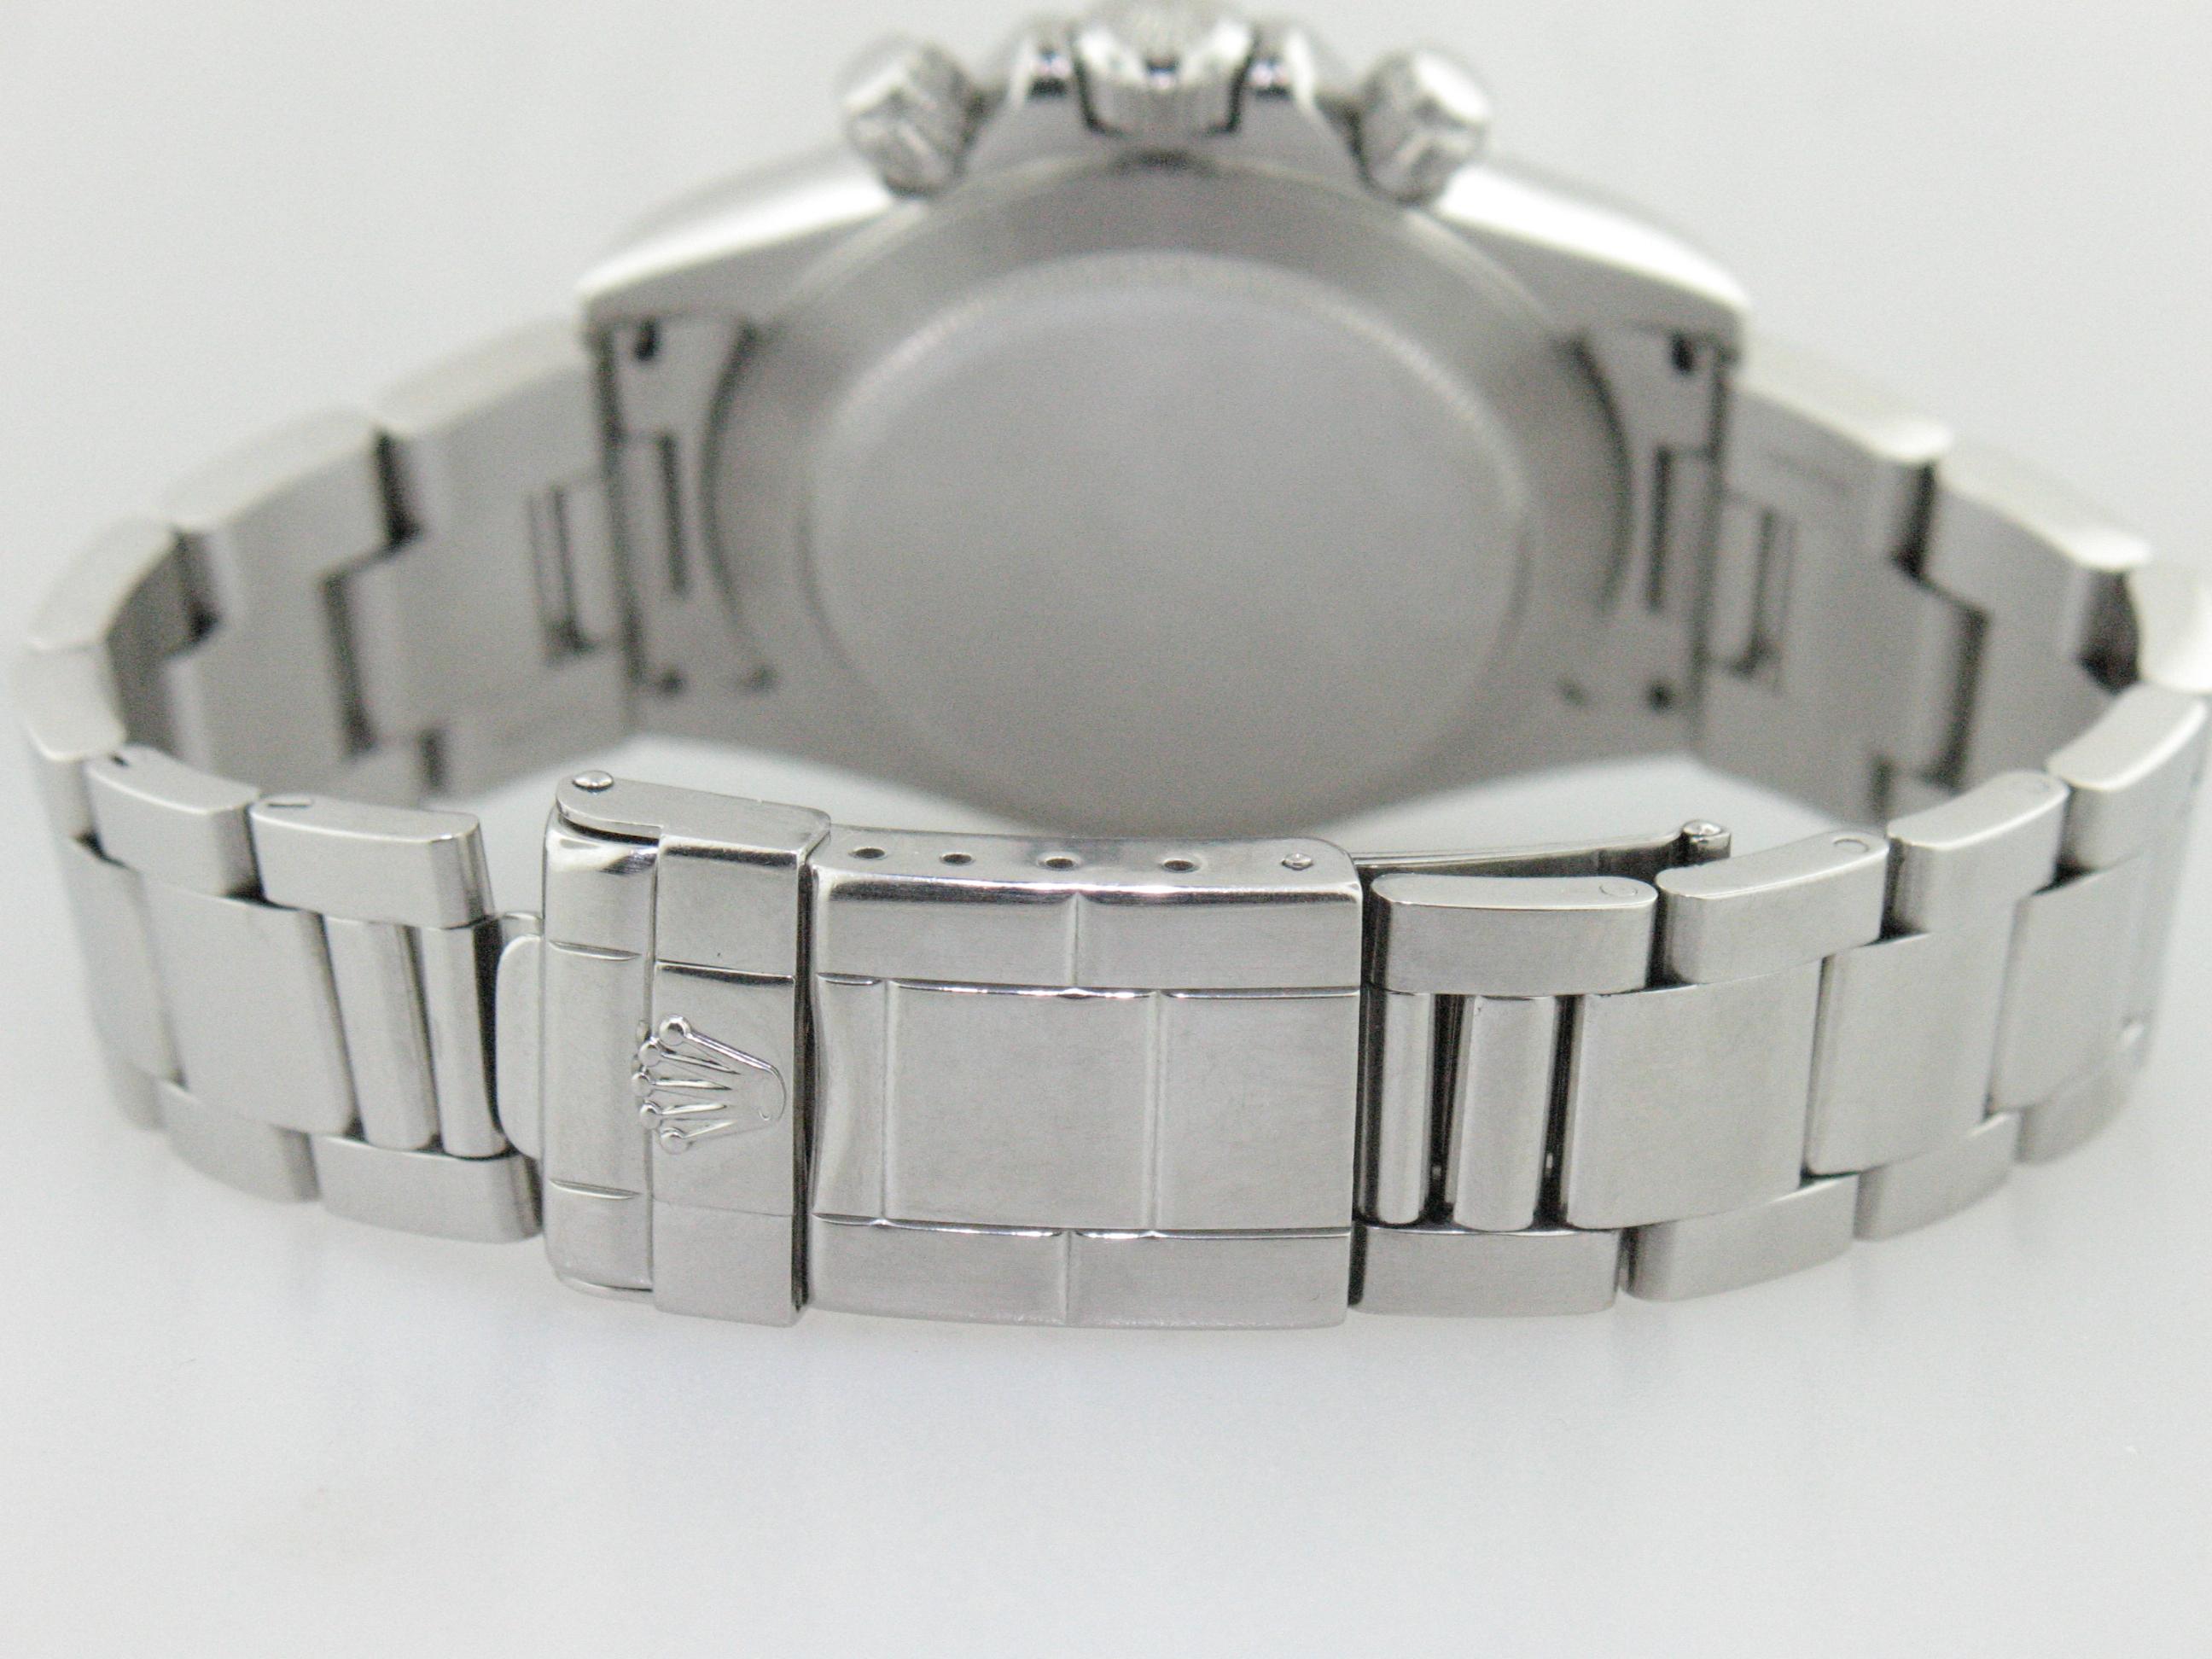 Rolex Daytona Stainless Steel With Zenith Movement 16520